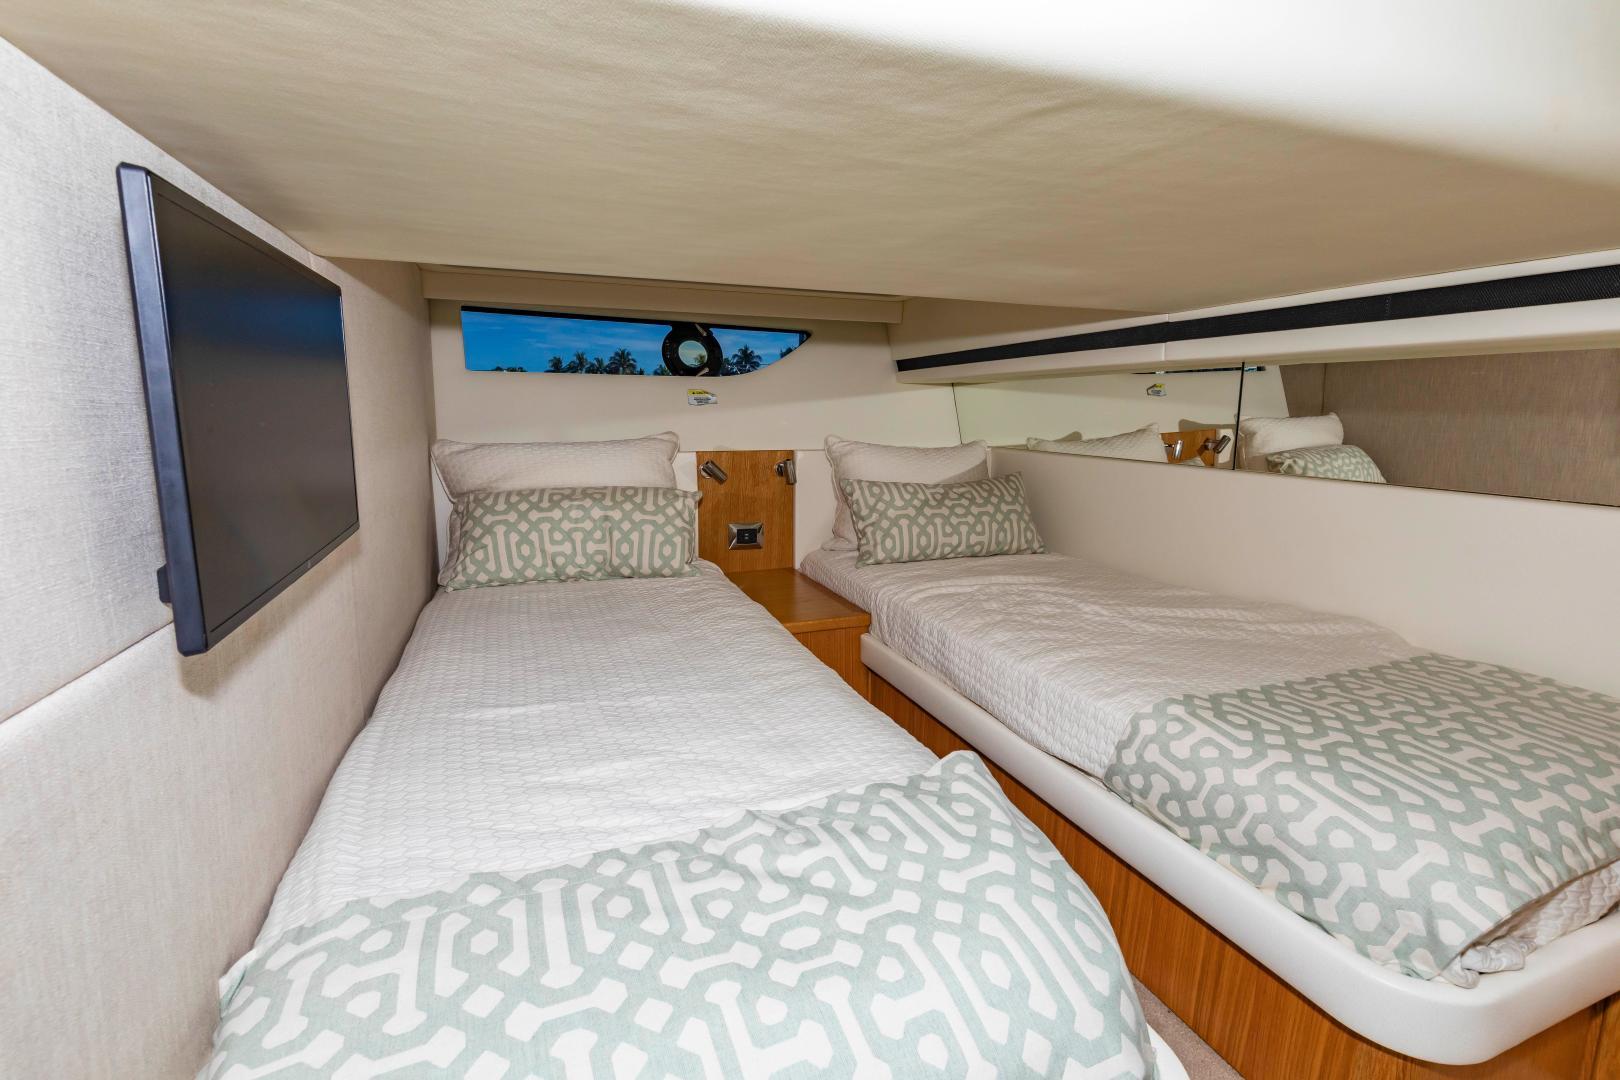 Riviera-395 SUV 2019-Ipanema Miami Beach-Florida-United States-1614913   Thumbnail